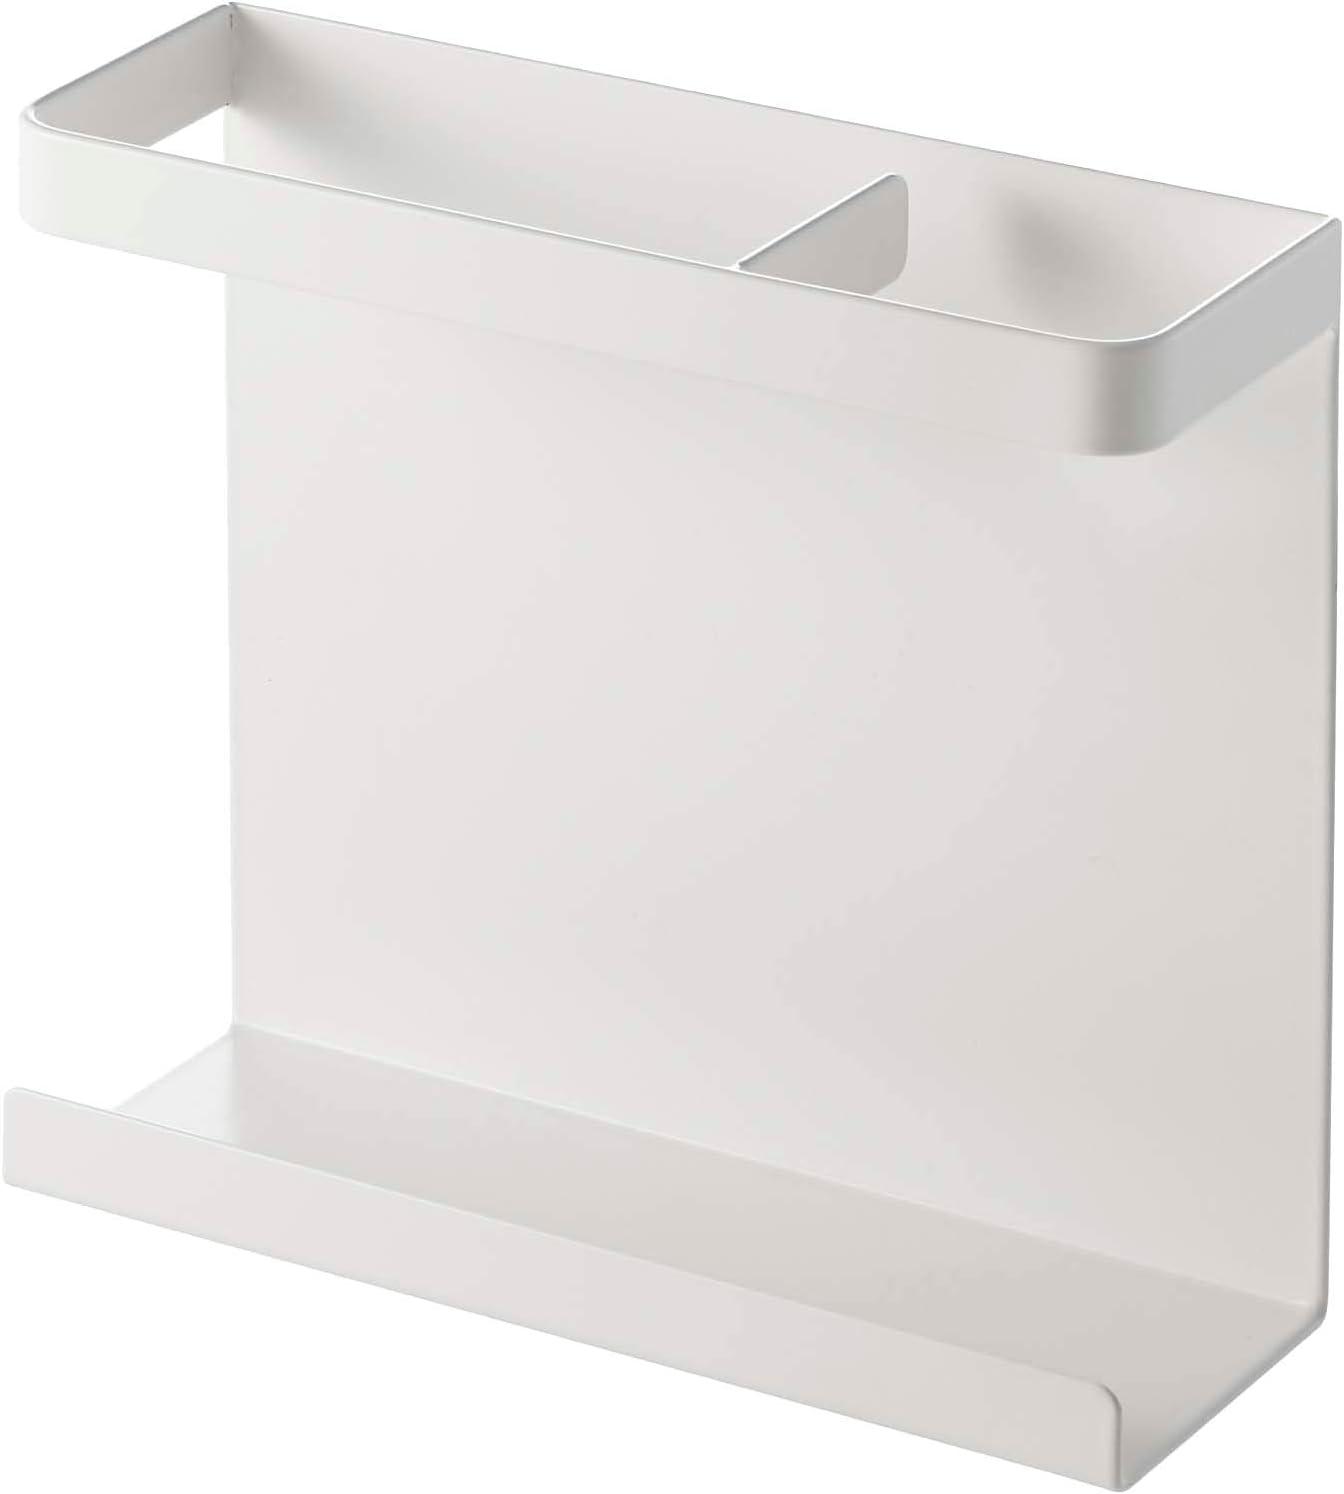 YAMAZAKI home Wrap Holder-Kitchen Storage, Magnetic Organizer, One Size, White